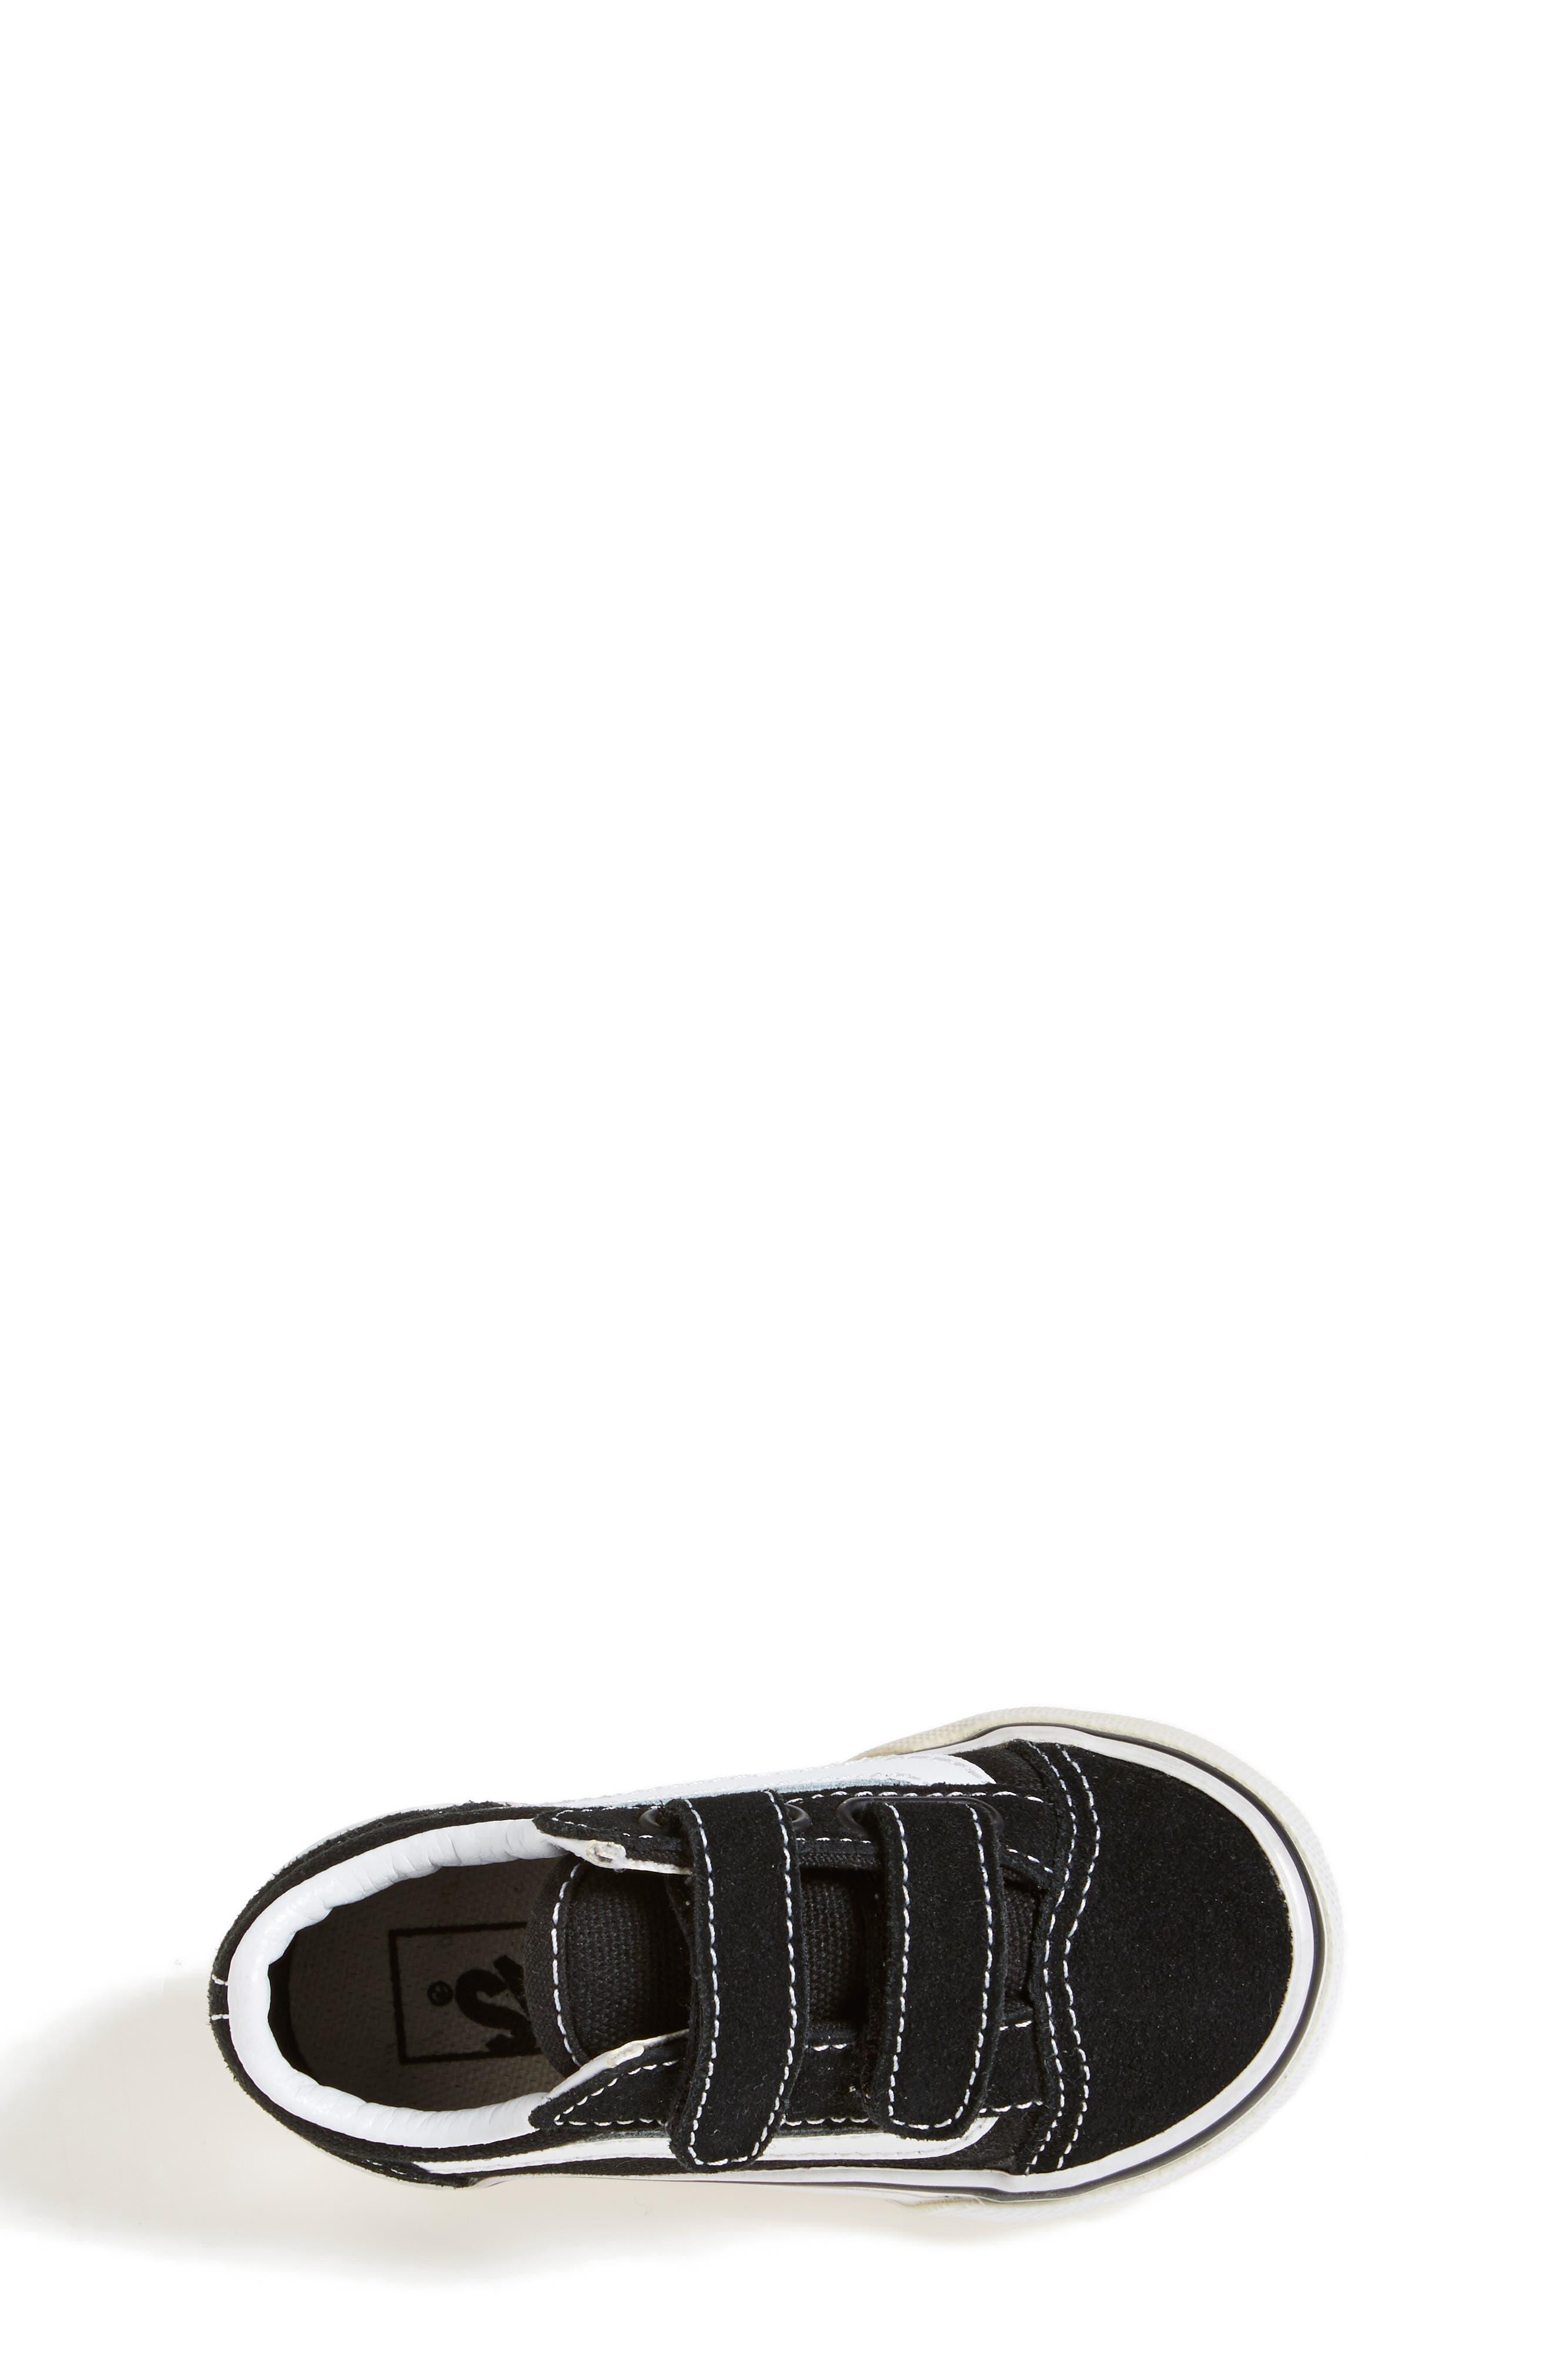 'Old Skool' Sneaker,                             Alternate thumbnail 3, color,                             Black